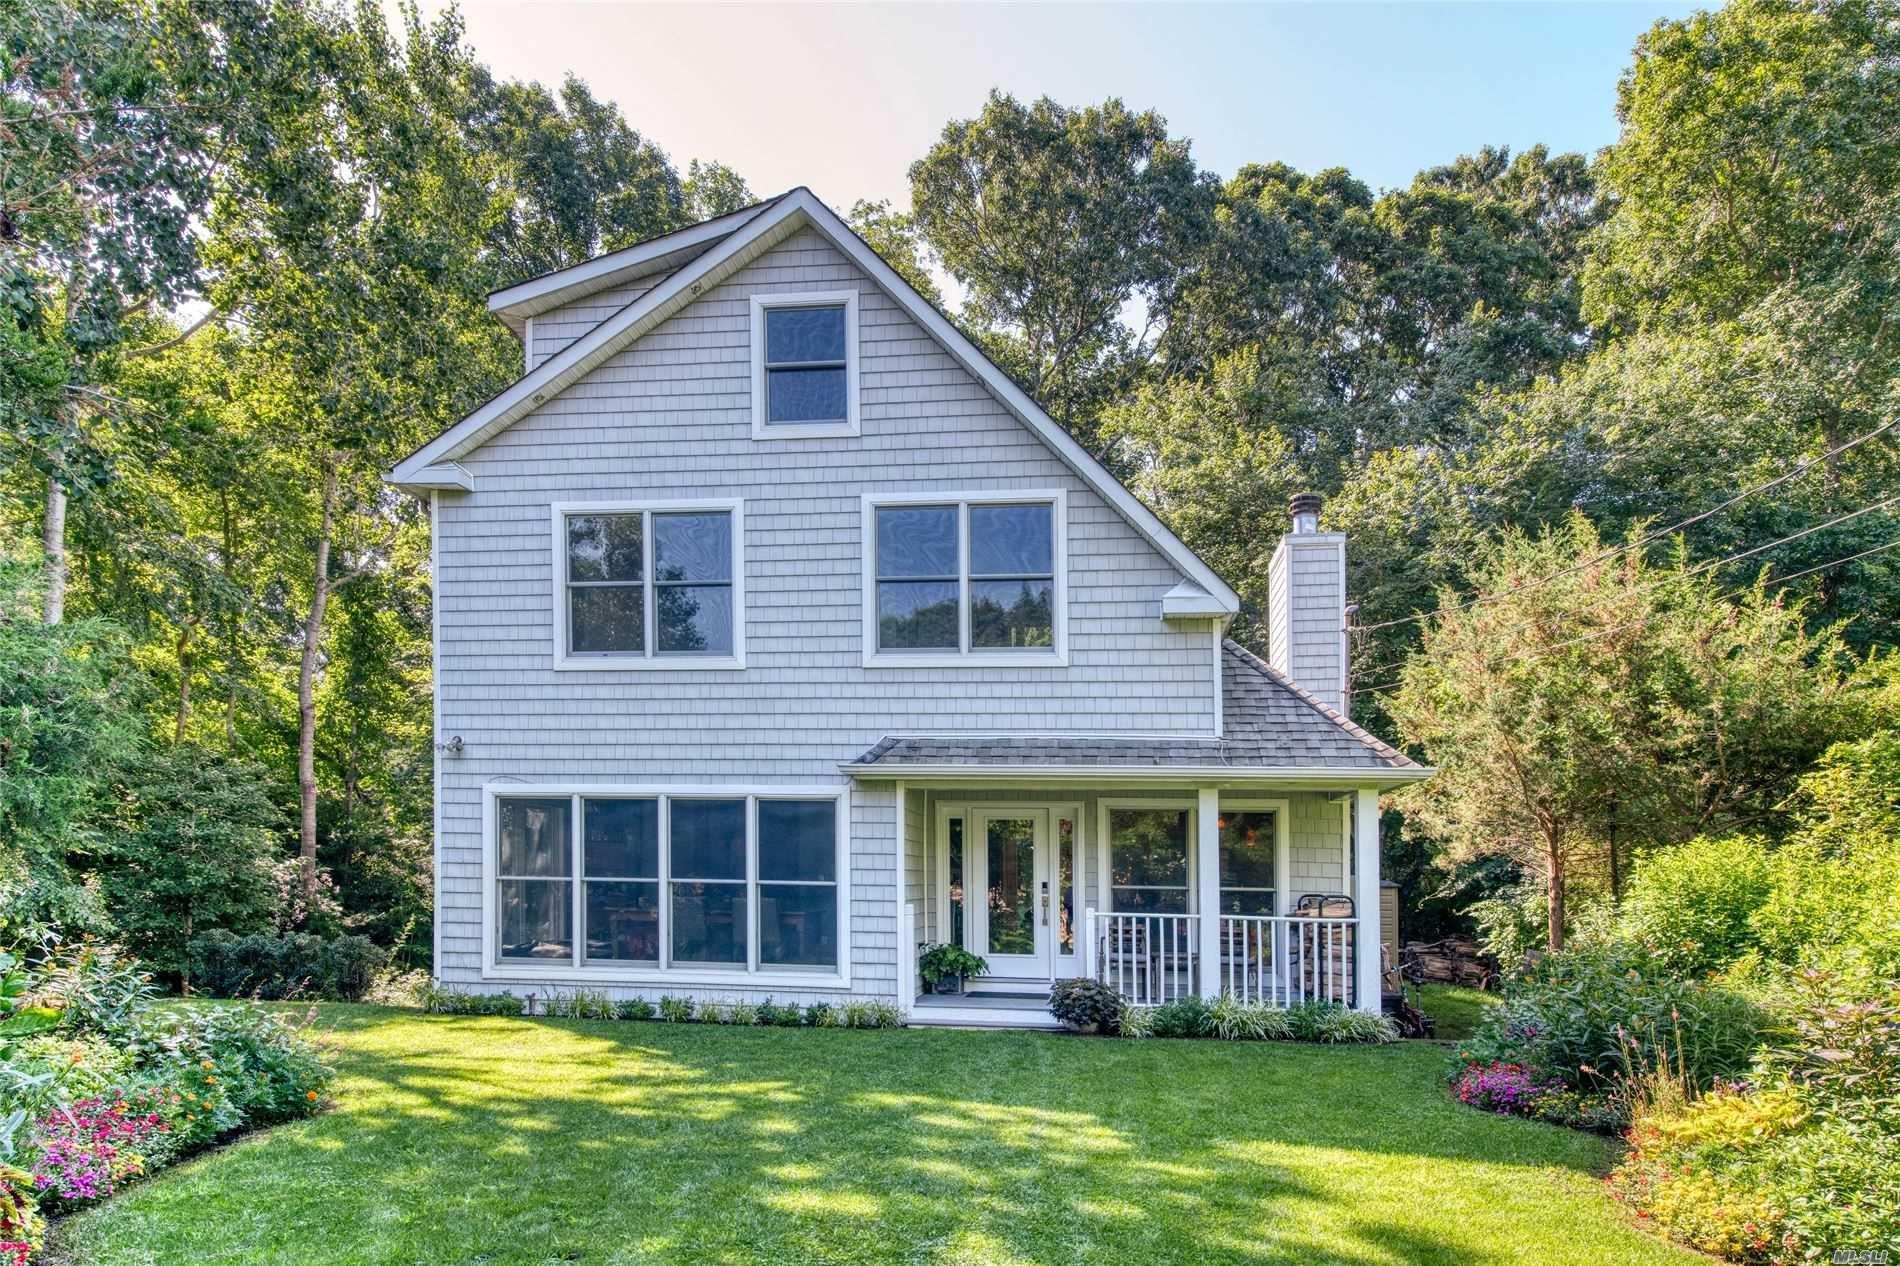 50 Pine Crest Lane Ln, Sag Harbor, NY 11963 - MLS#: 3239961